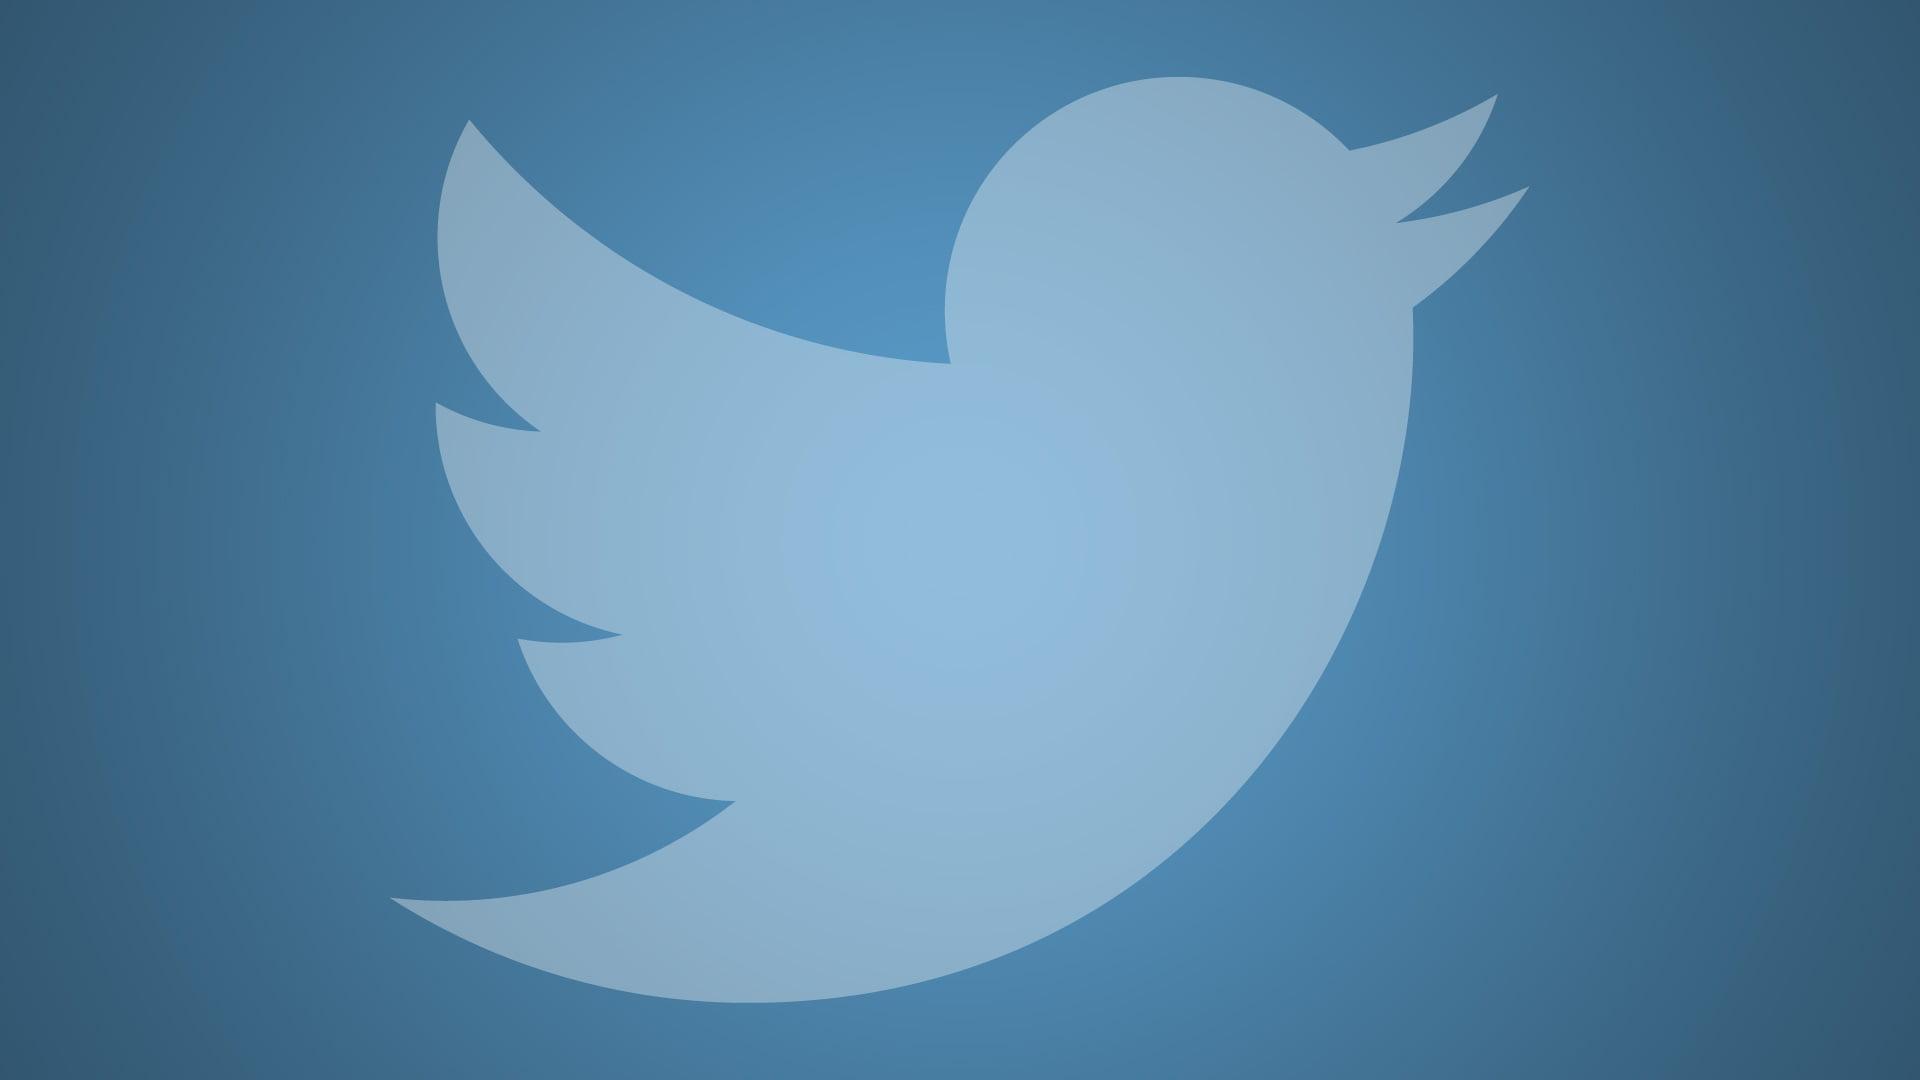 twitter toplu takip birakma kodu